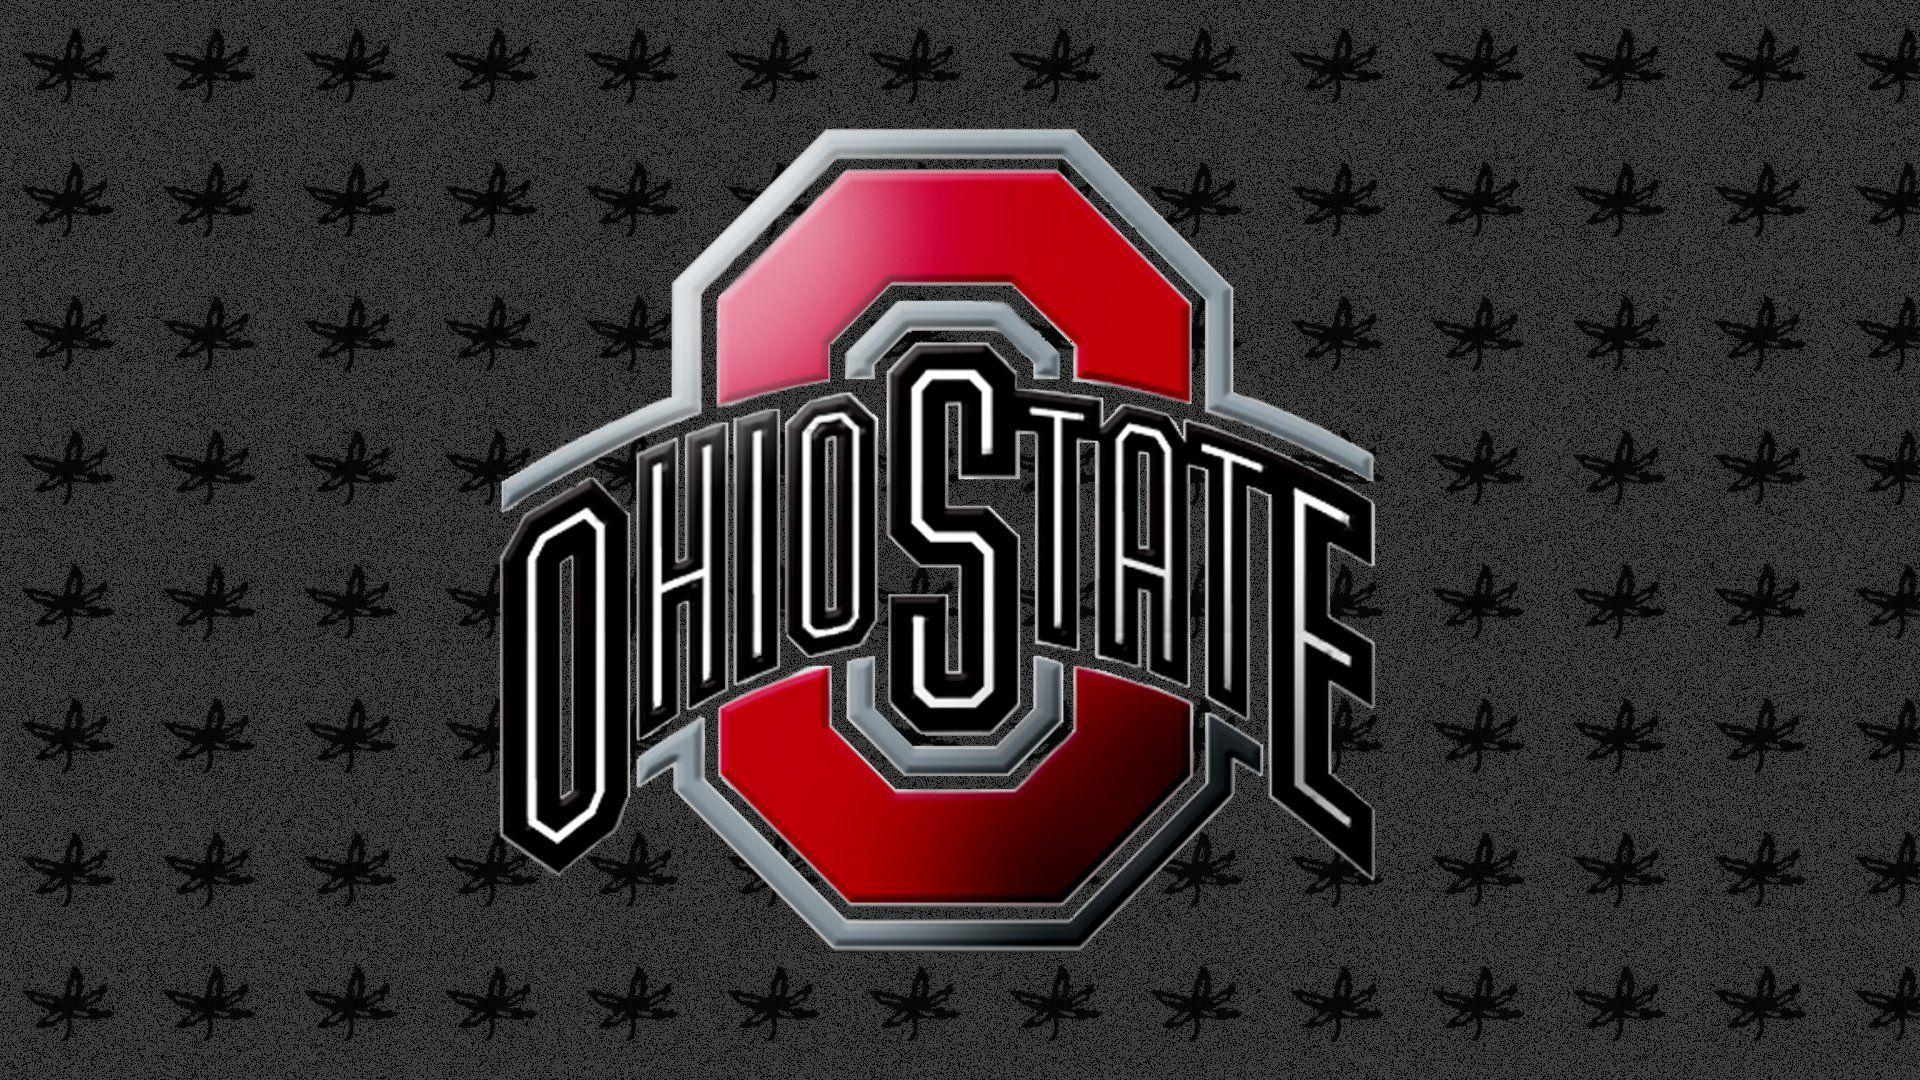 ohio state football Google Search Ohio state buckeyes